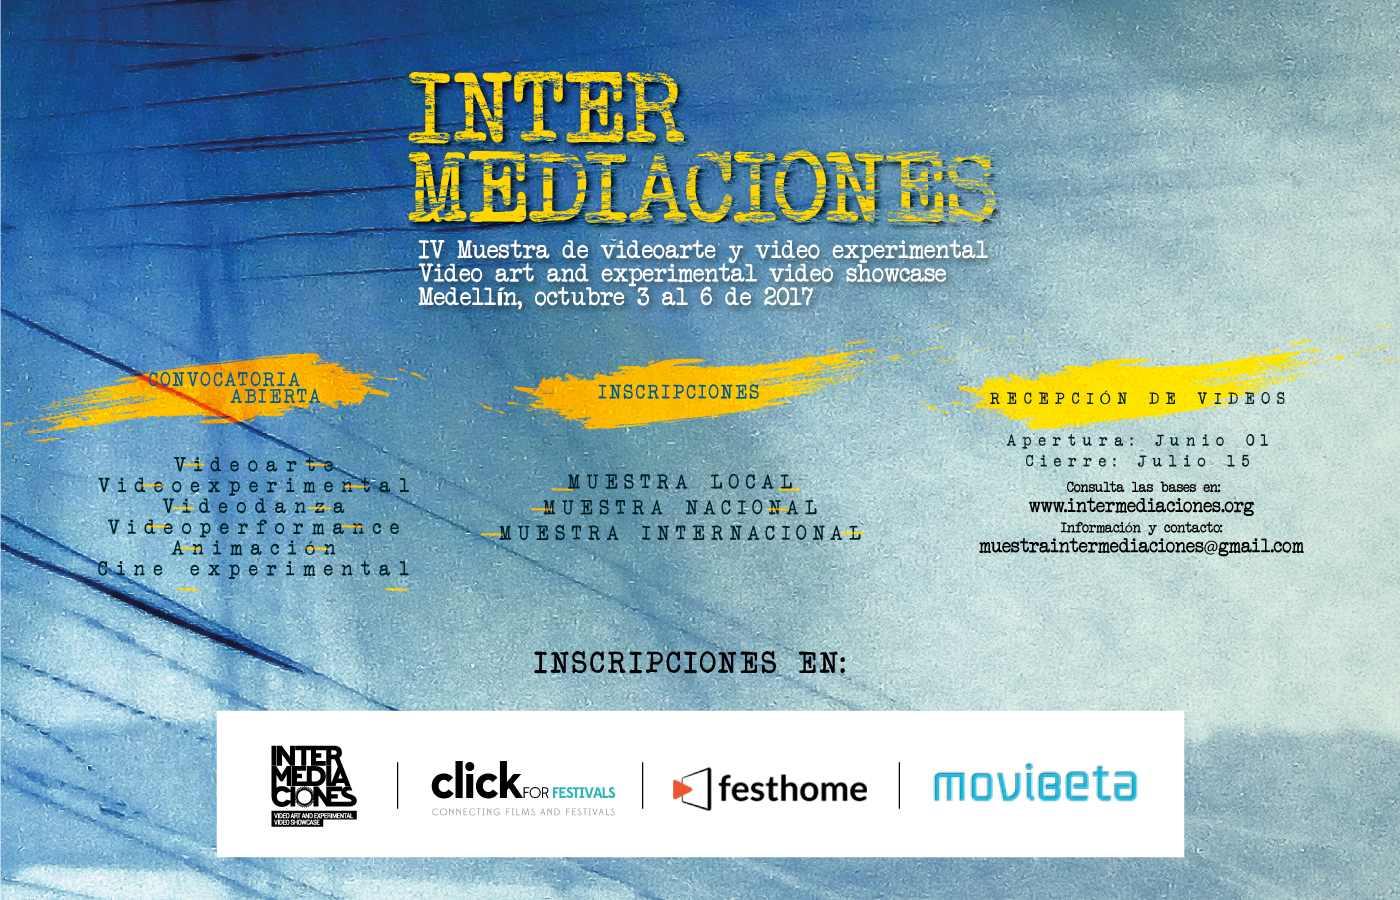 Muestra Internacional